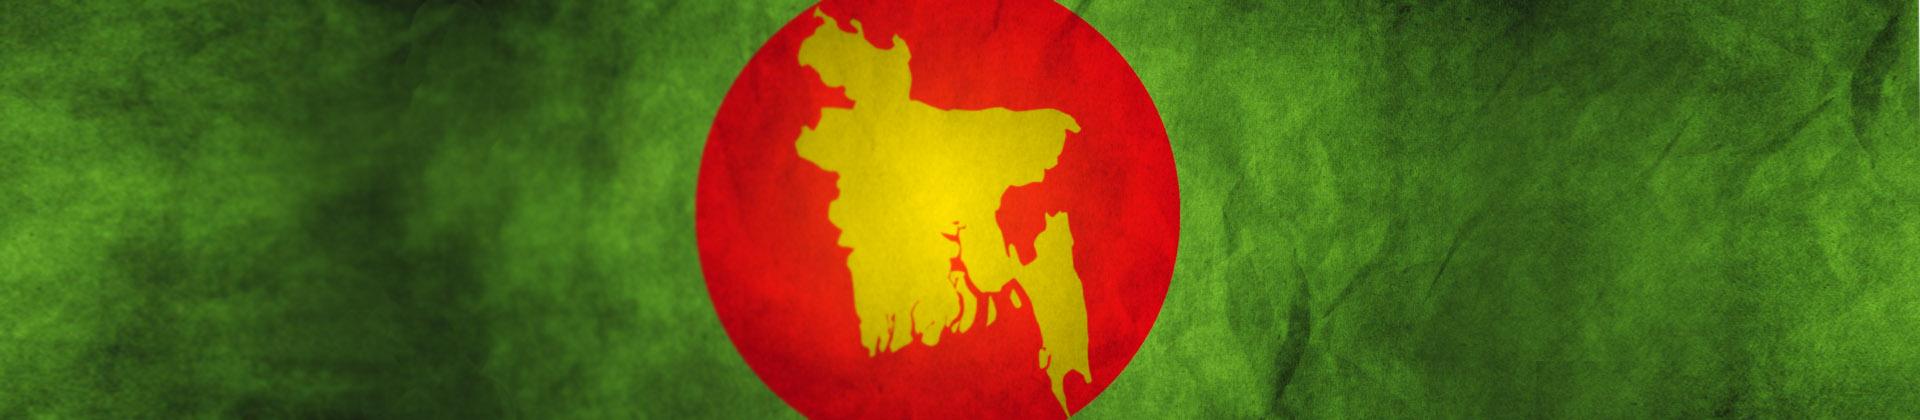 Home W 228 Rtsil 228 In Bangladesh